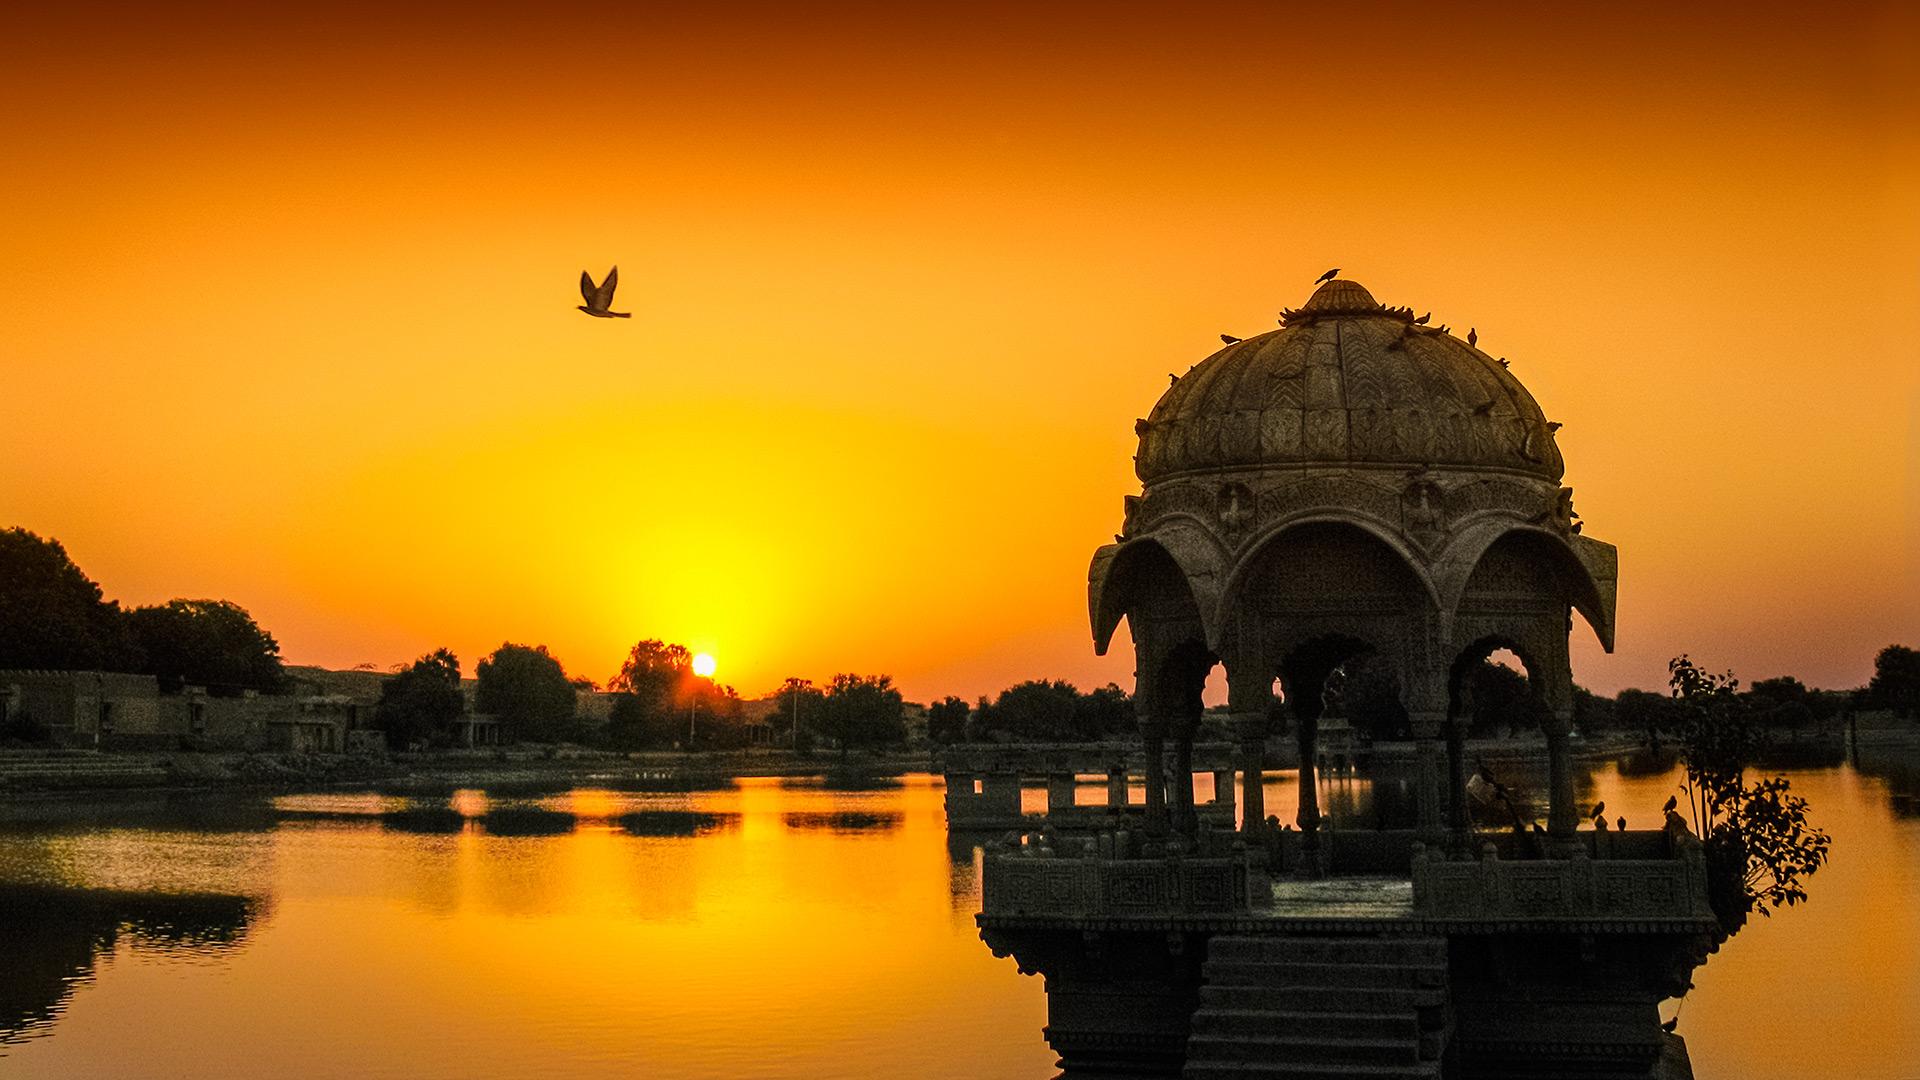 Jaisalmer. Rajasthan, India